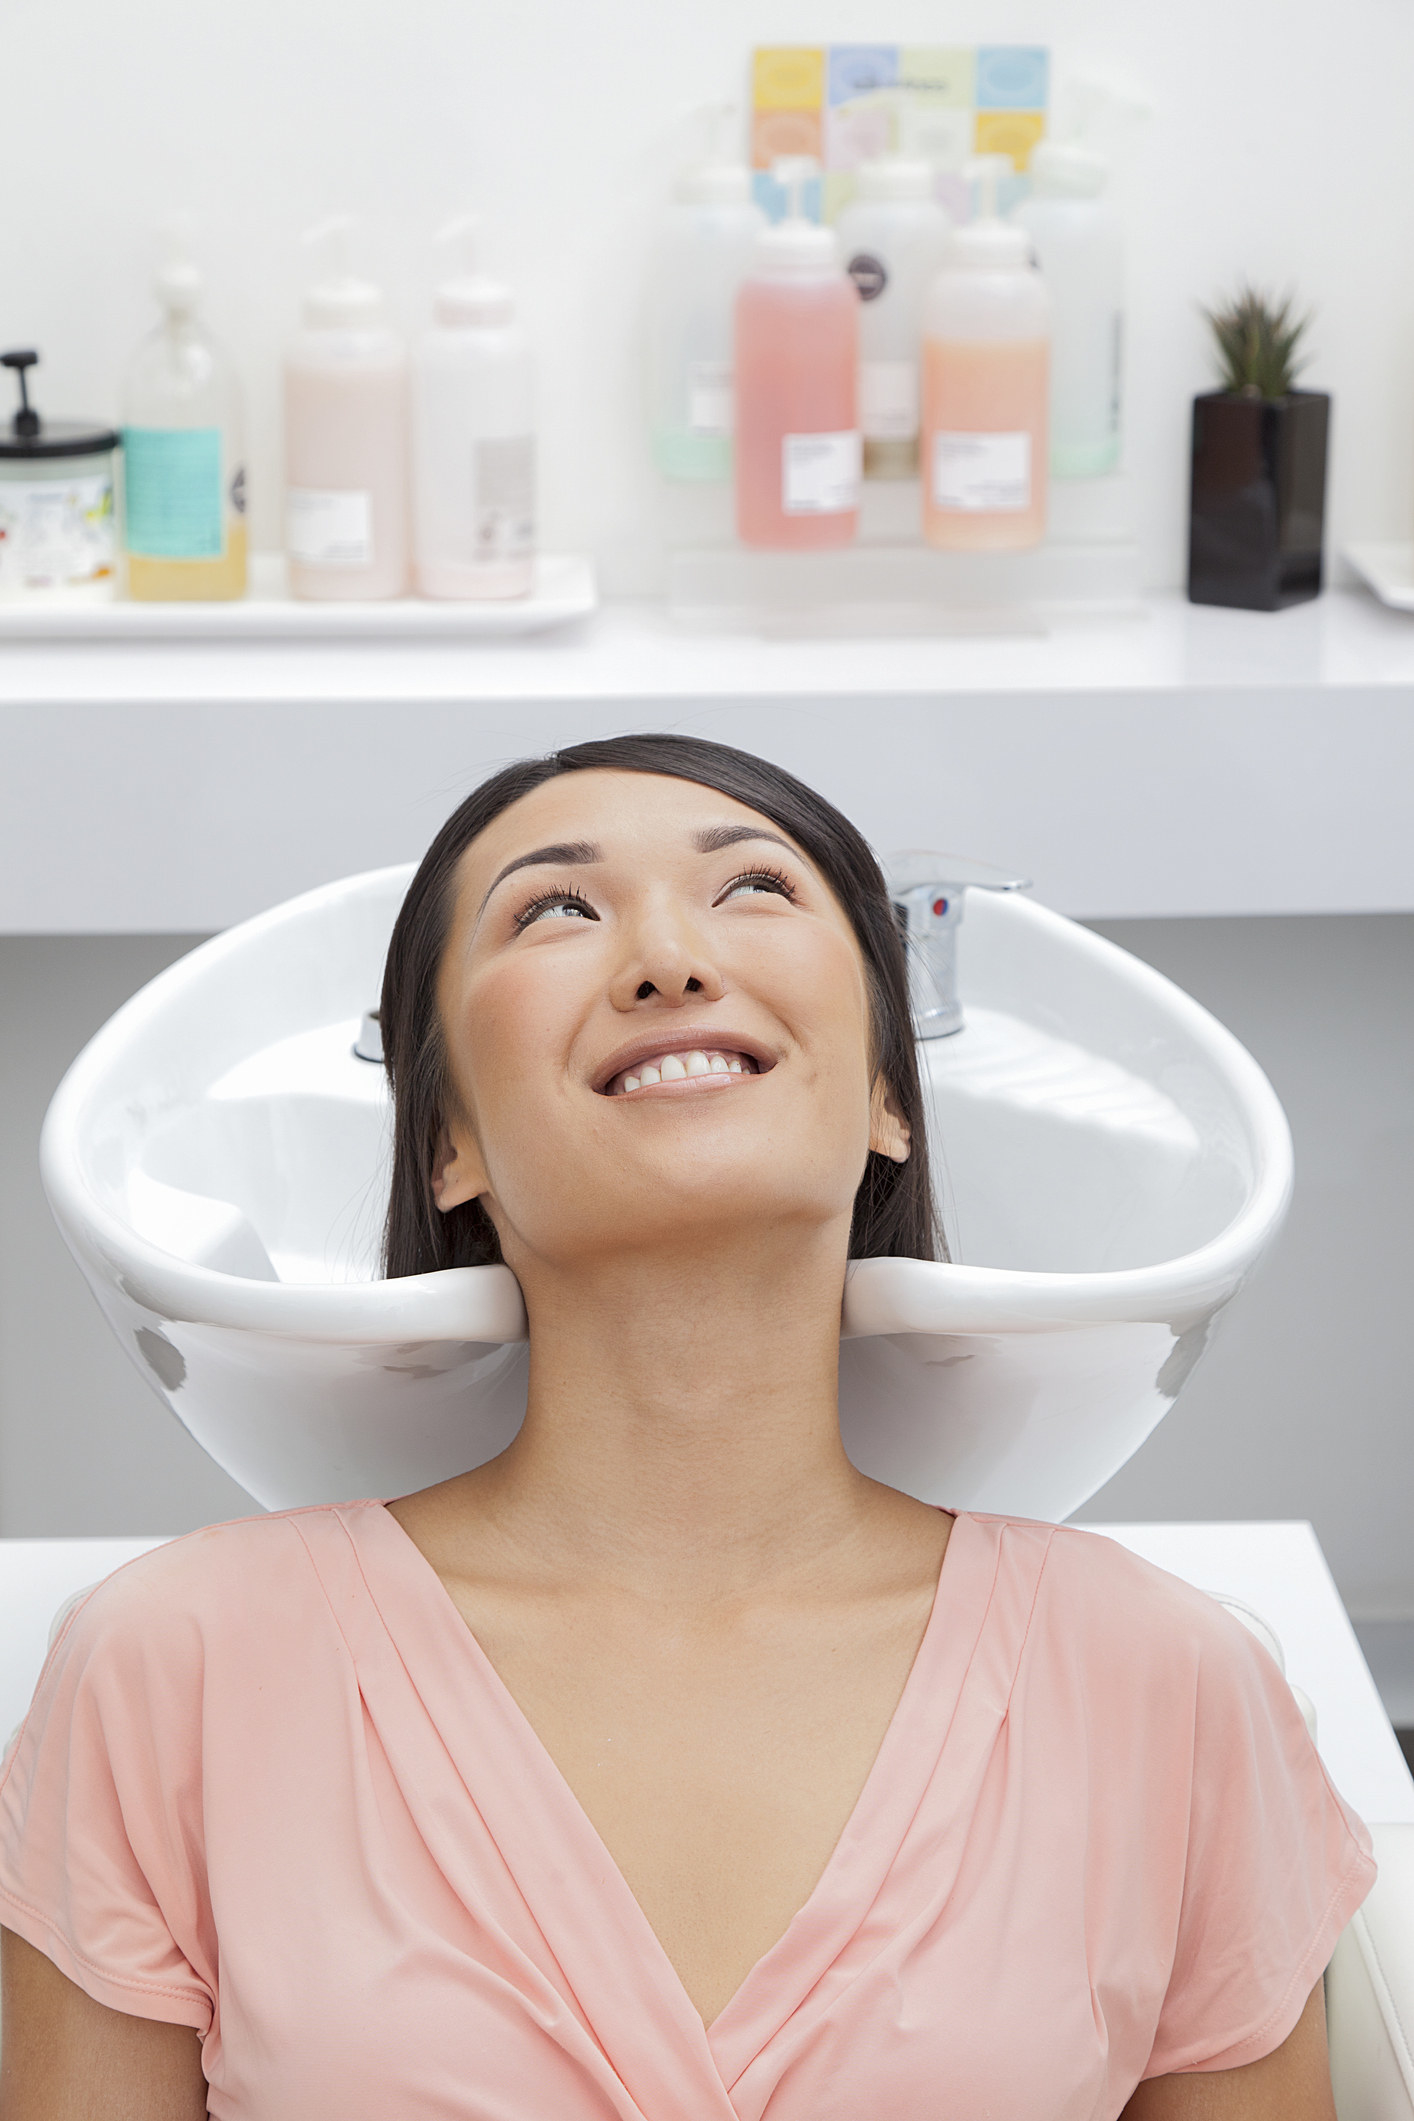 A woman receiving a shampoo at a salon